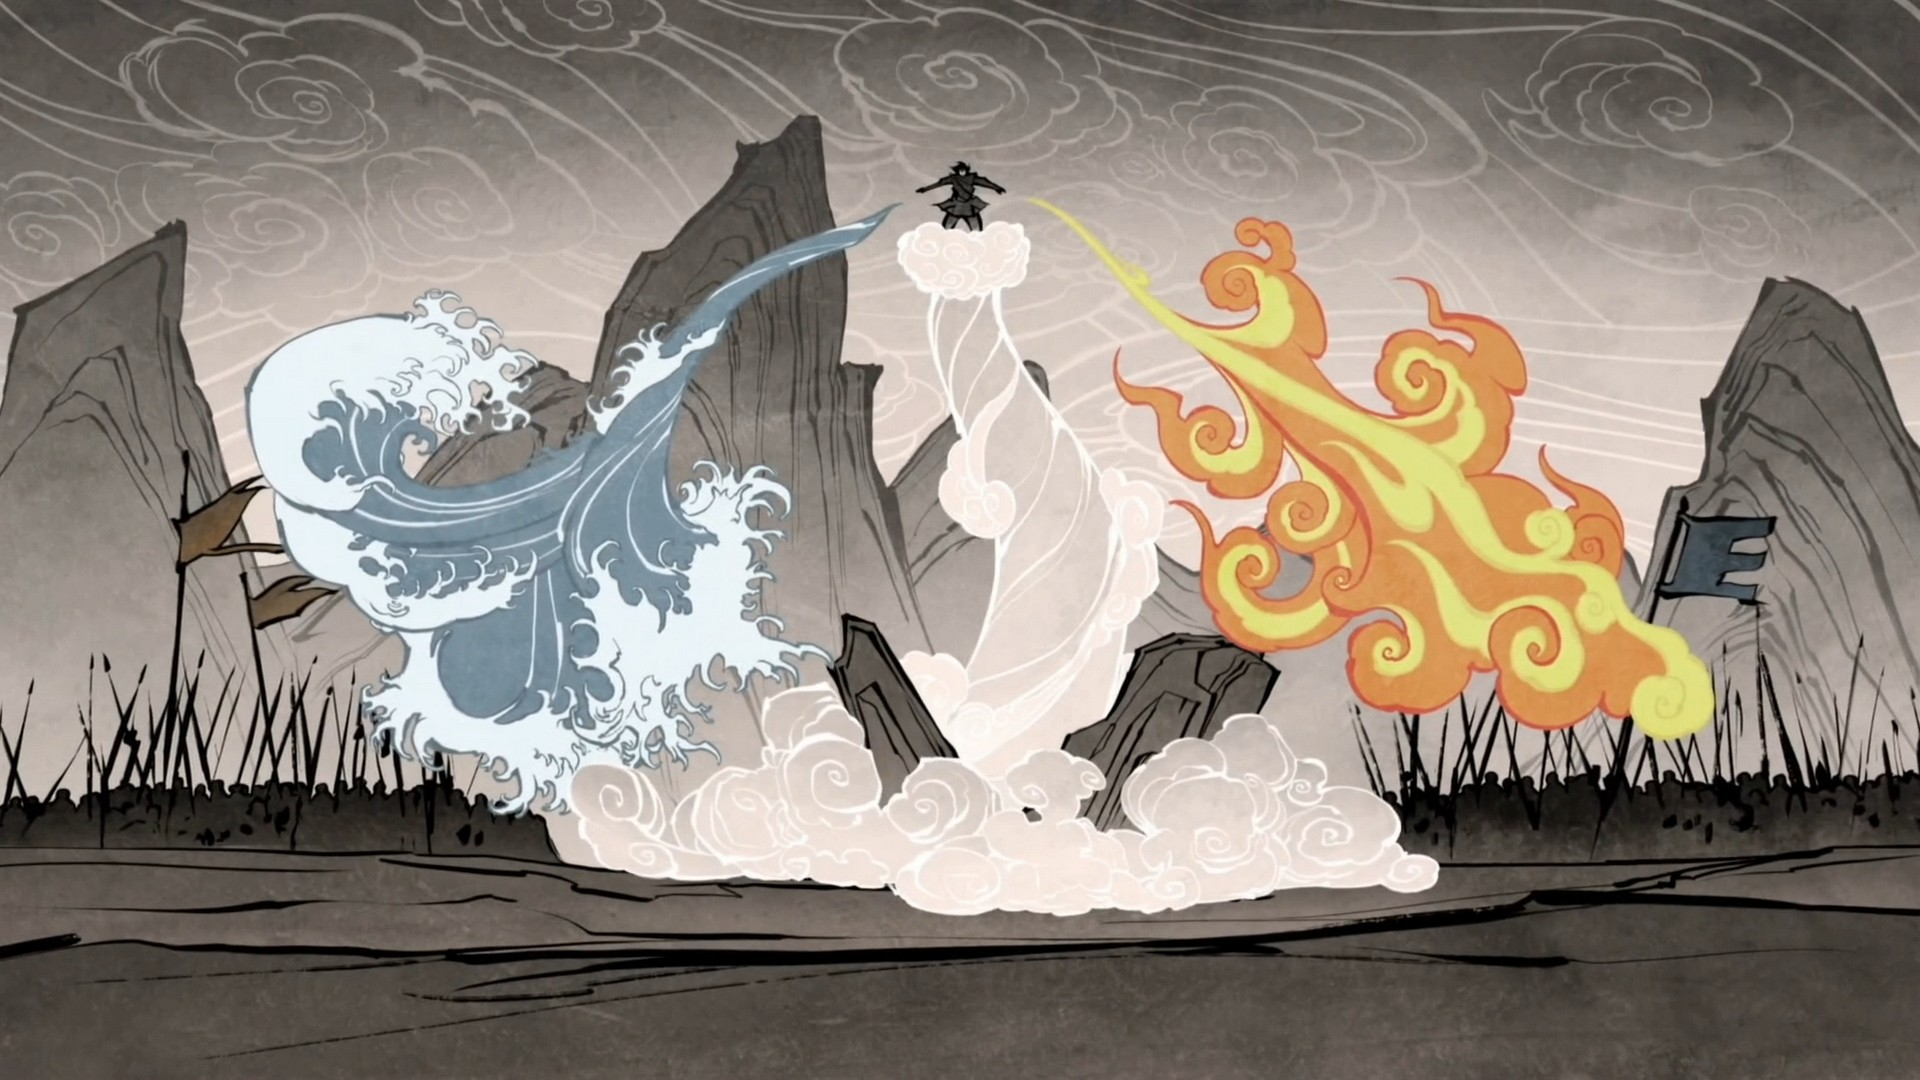 Desktop Wallpaper Avatar The Last Airbender Cartoon Series Hd Image Picture Background Vhjd9y